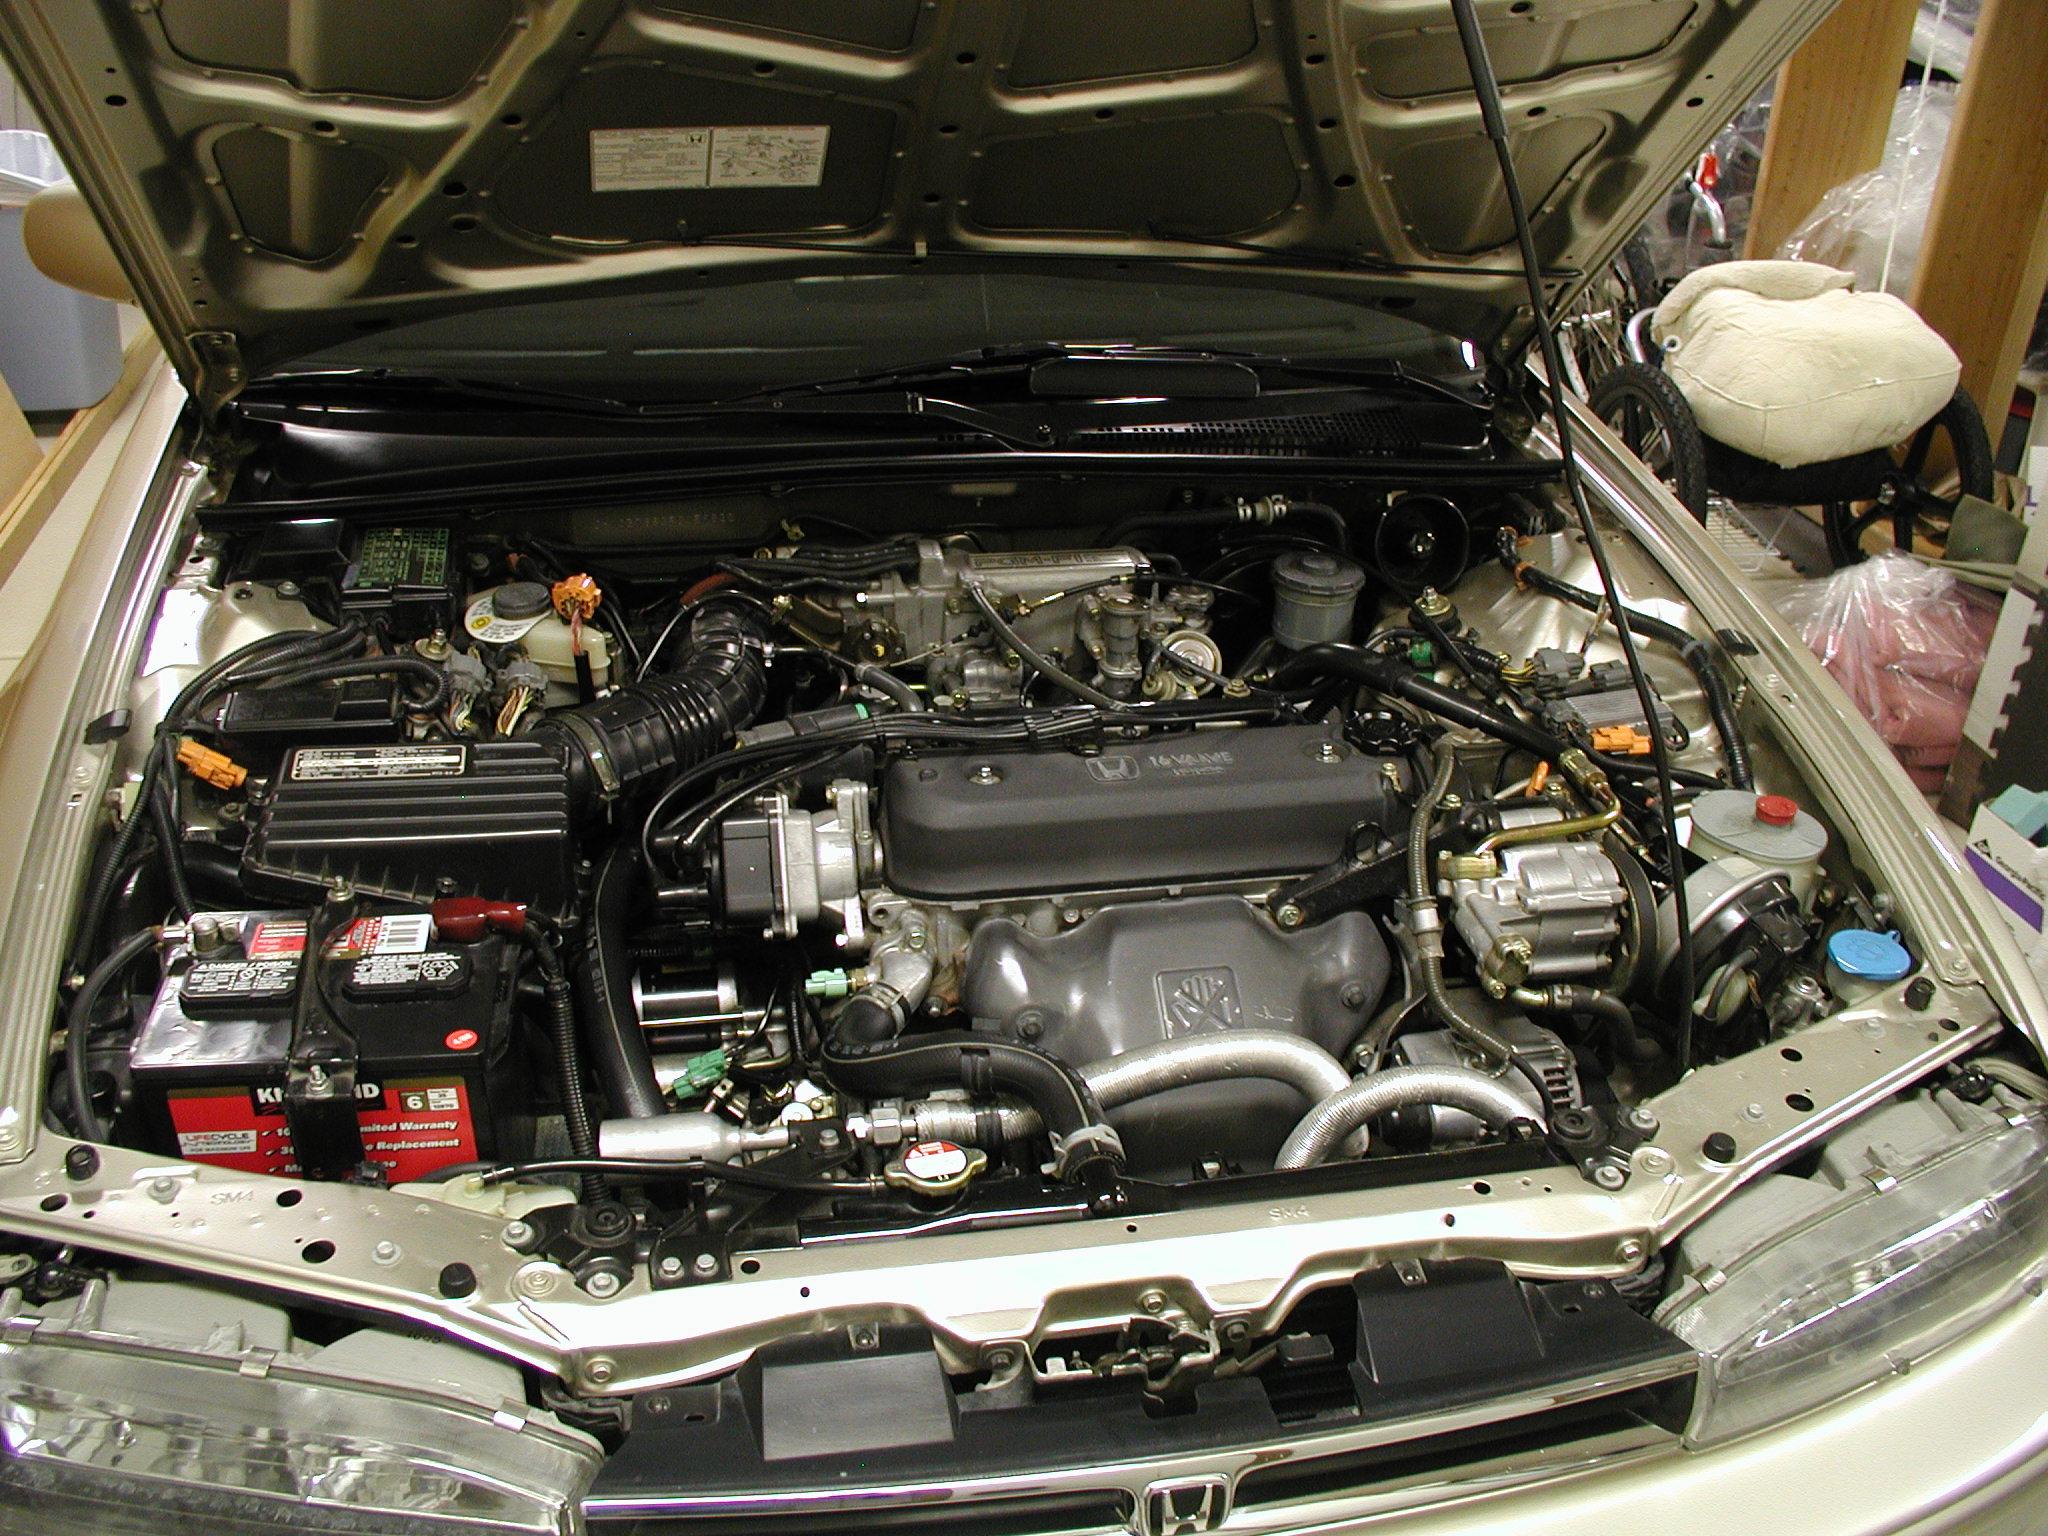 91 Honda Accord Automatic Transmission Wiring Diagram | Online ... on